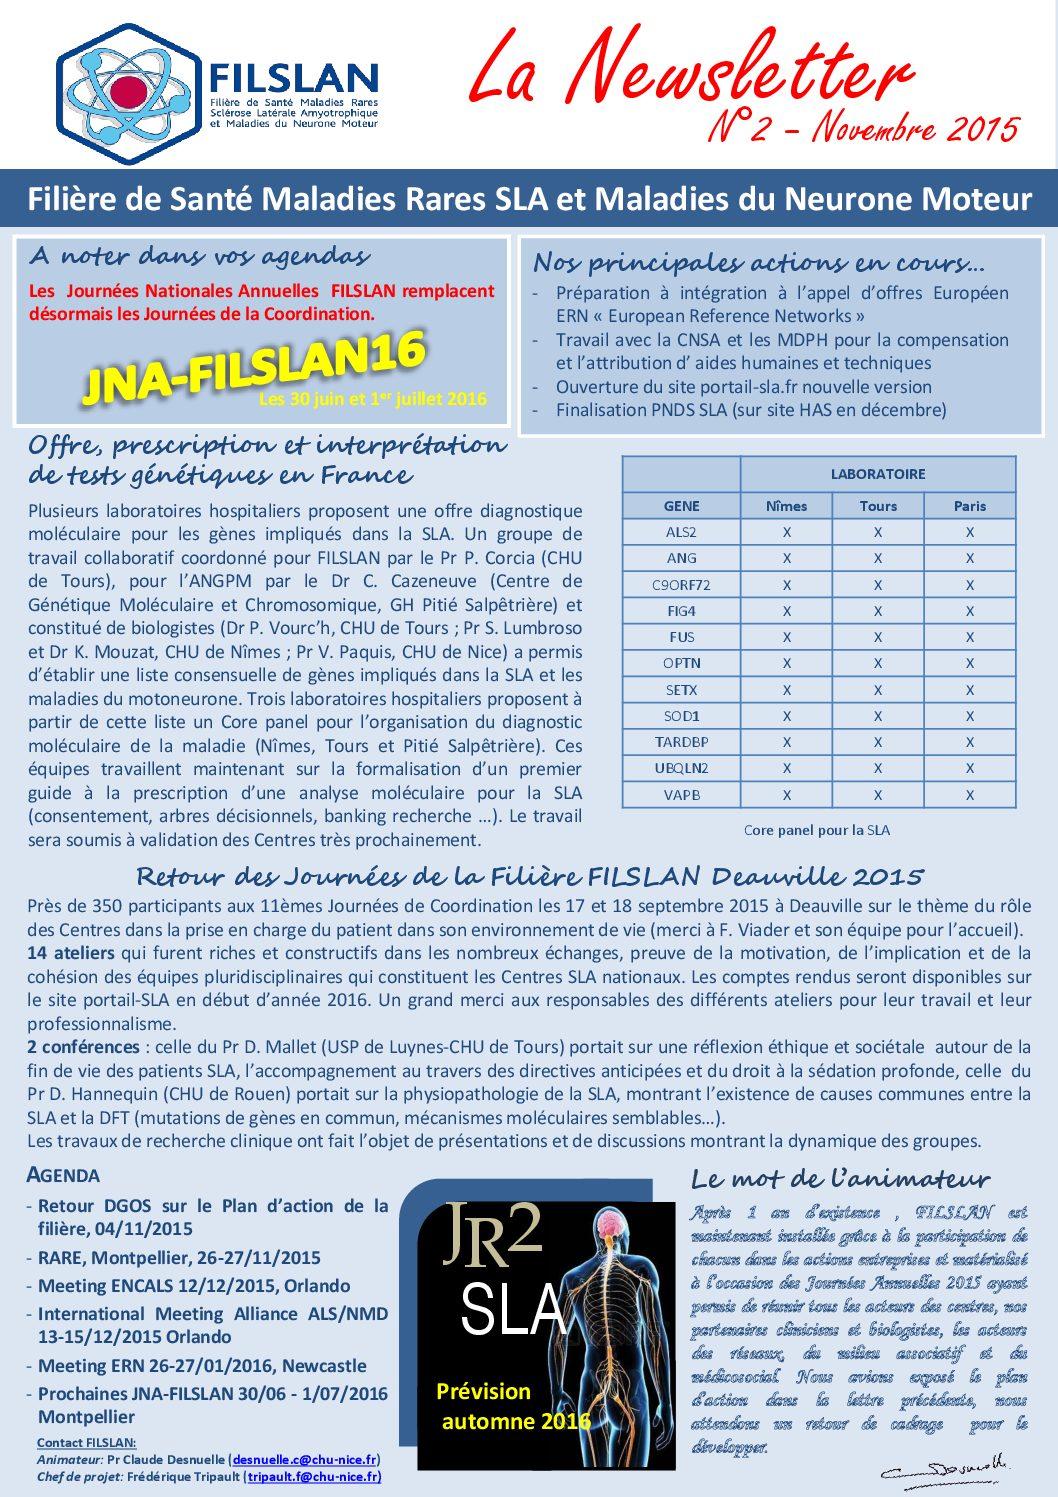 Newsletter N°2 - Novembre 2015